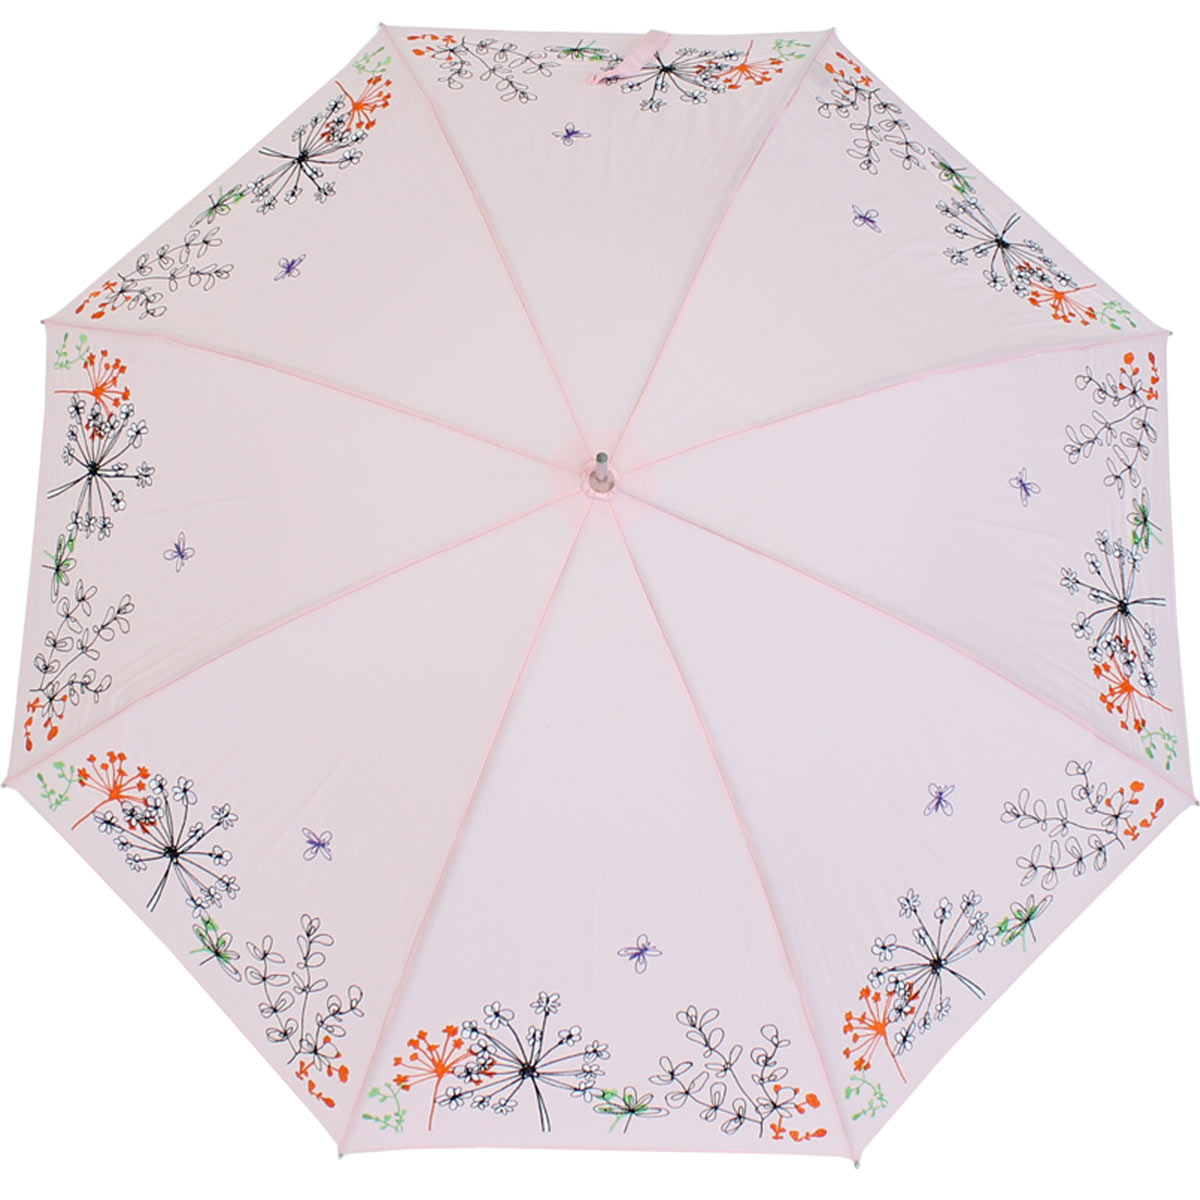 sonnen und regenschirm uv schutz lady butterfly long rose 28 99 eur. Black Bedroom Furniture Sets. Home Design Ideas